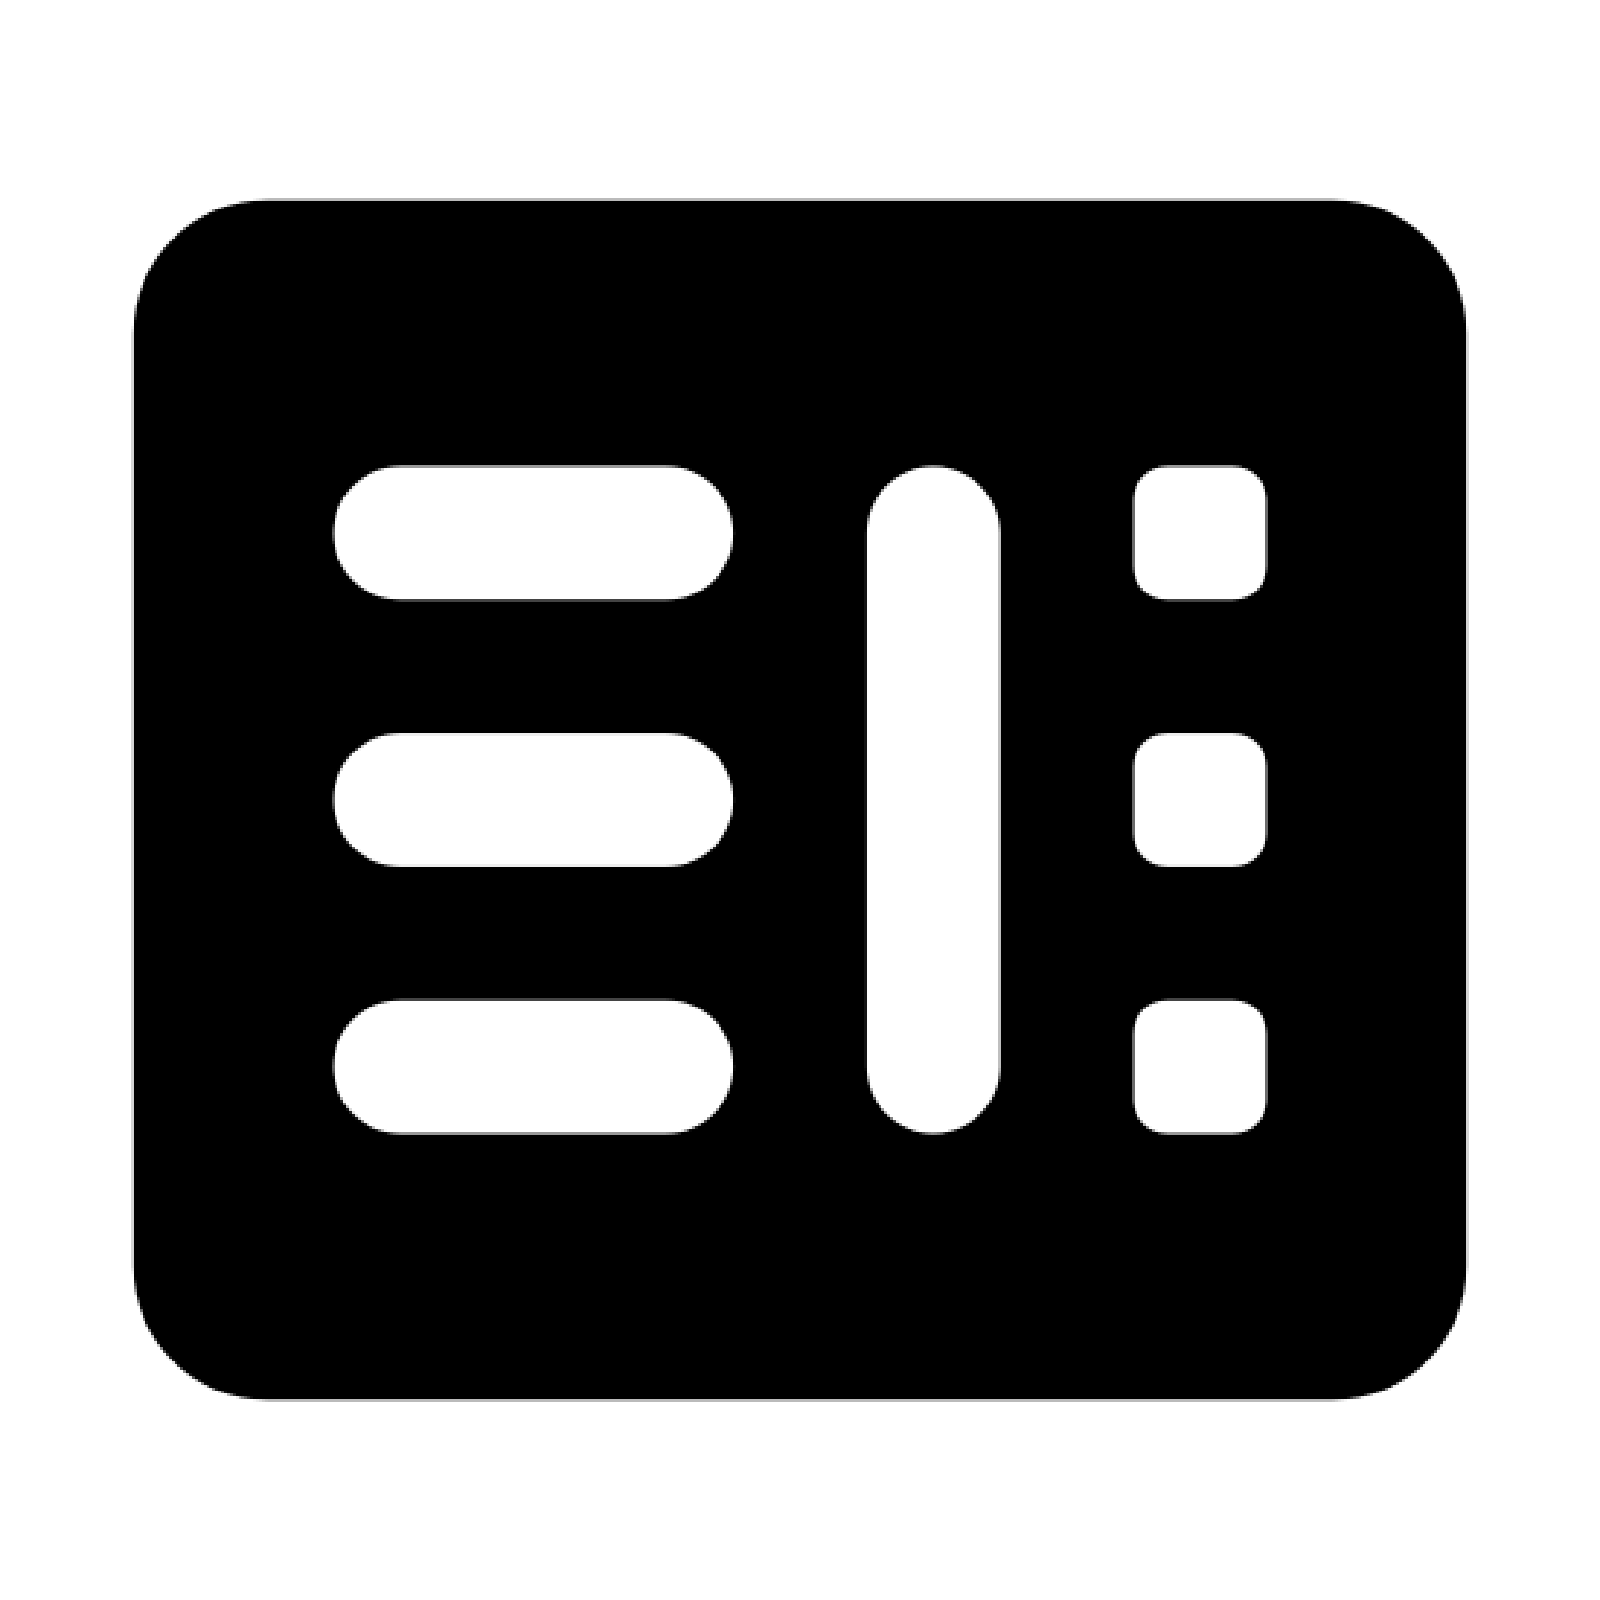 Summary List icon